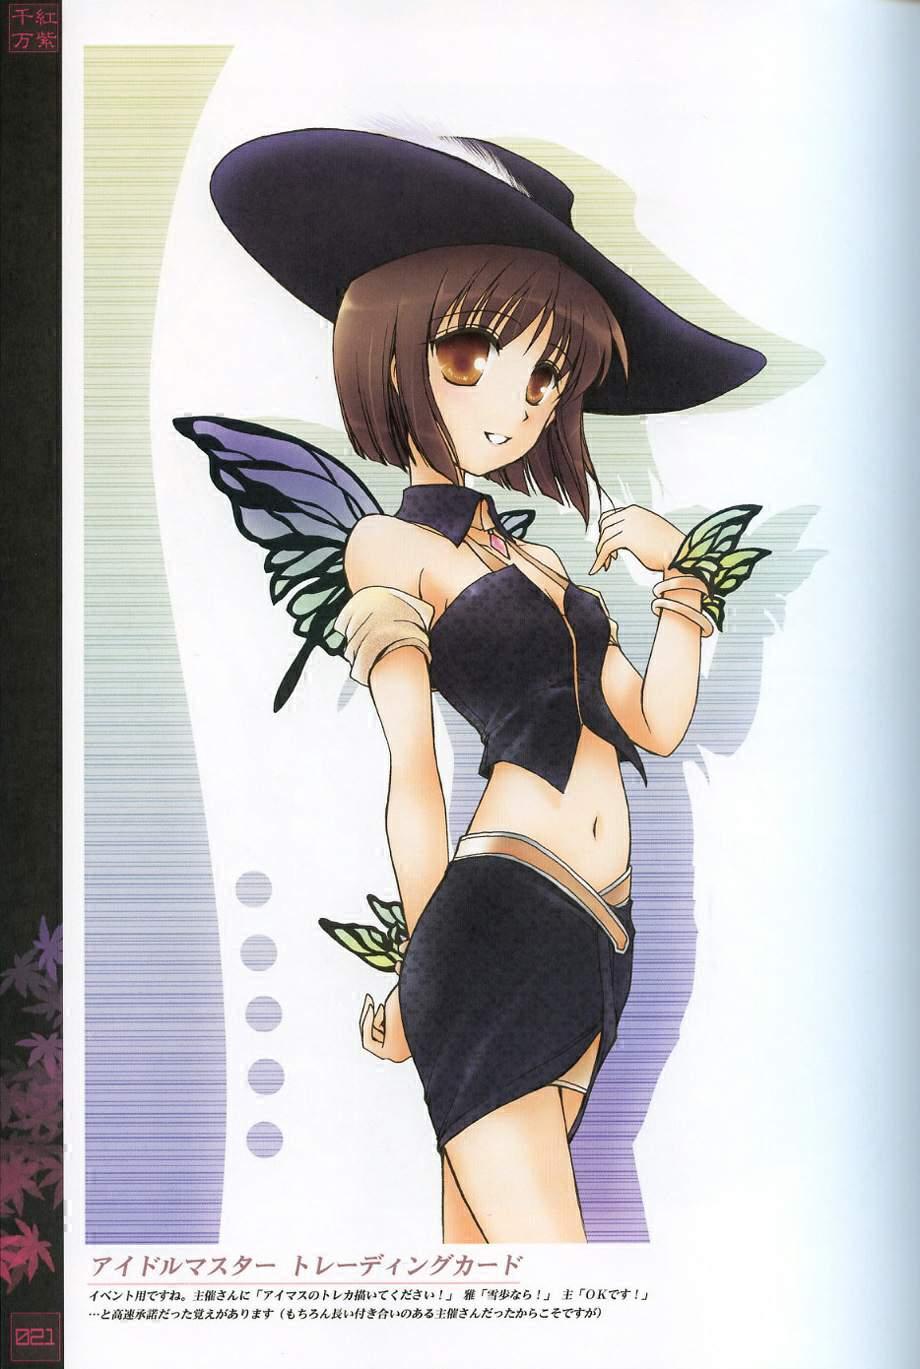 Senkou Banshi image by Miyabi Fujieda